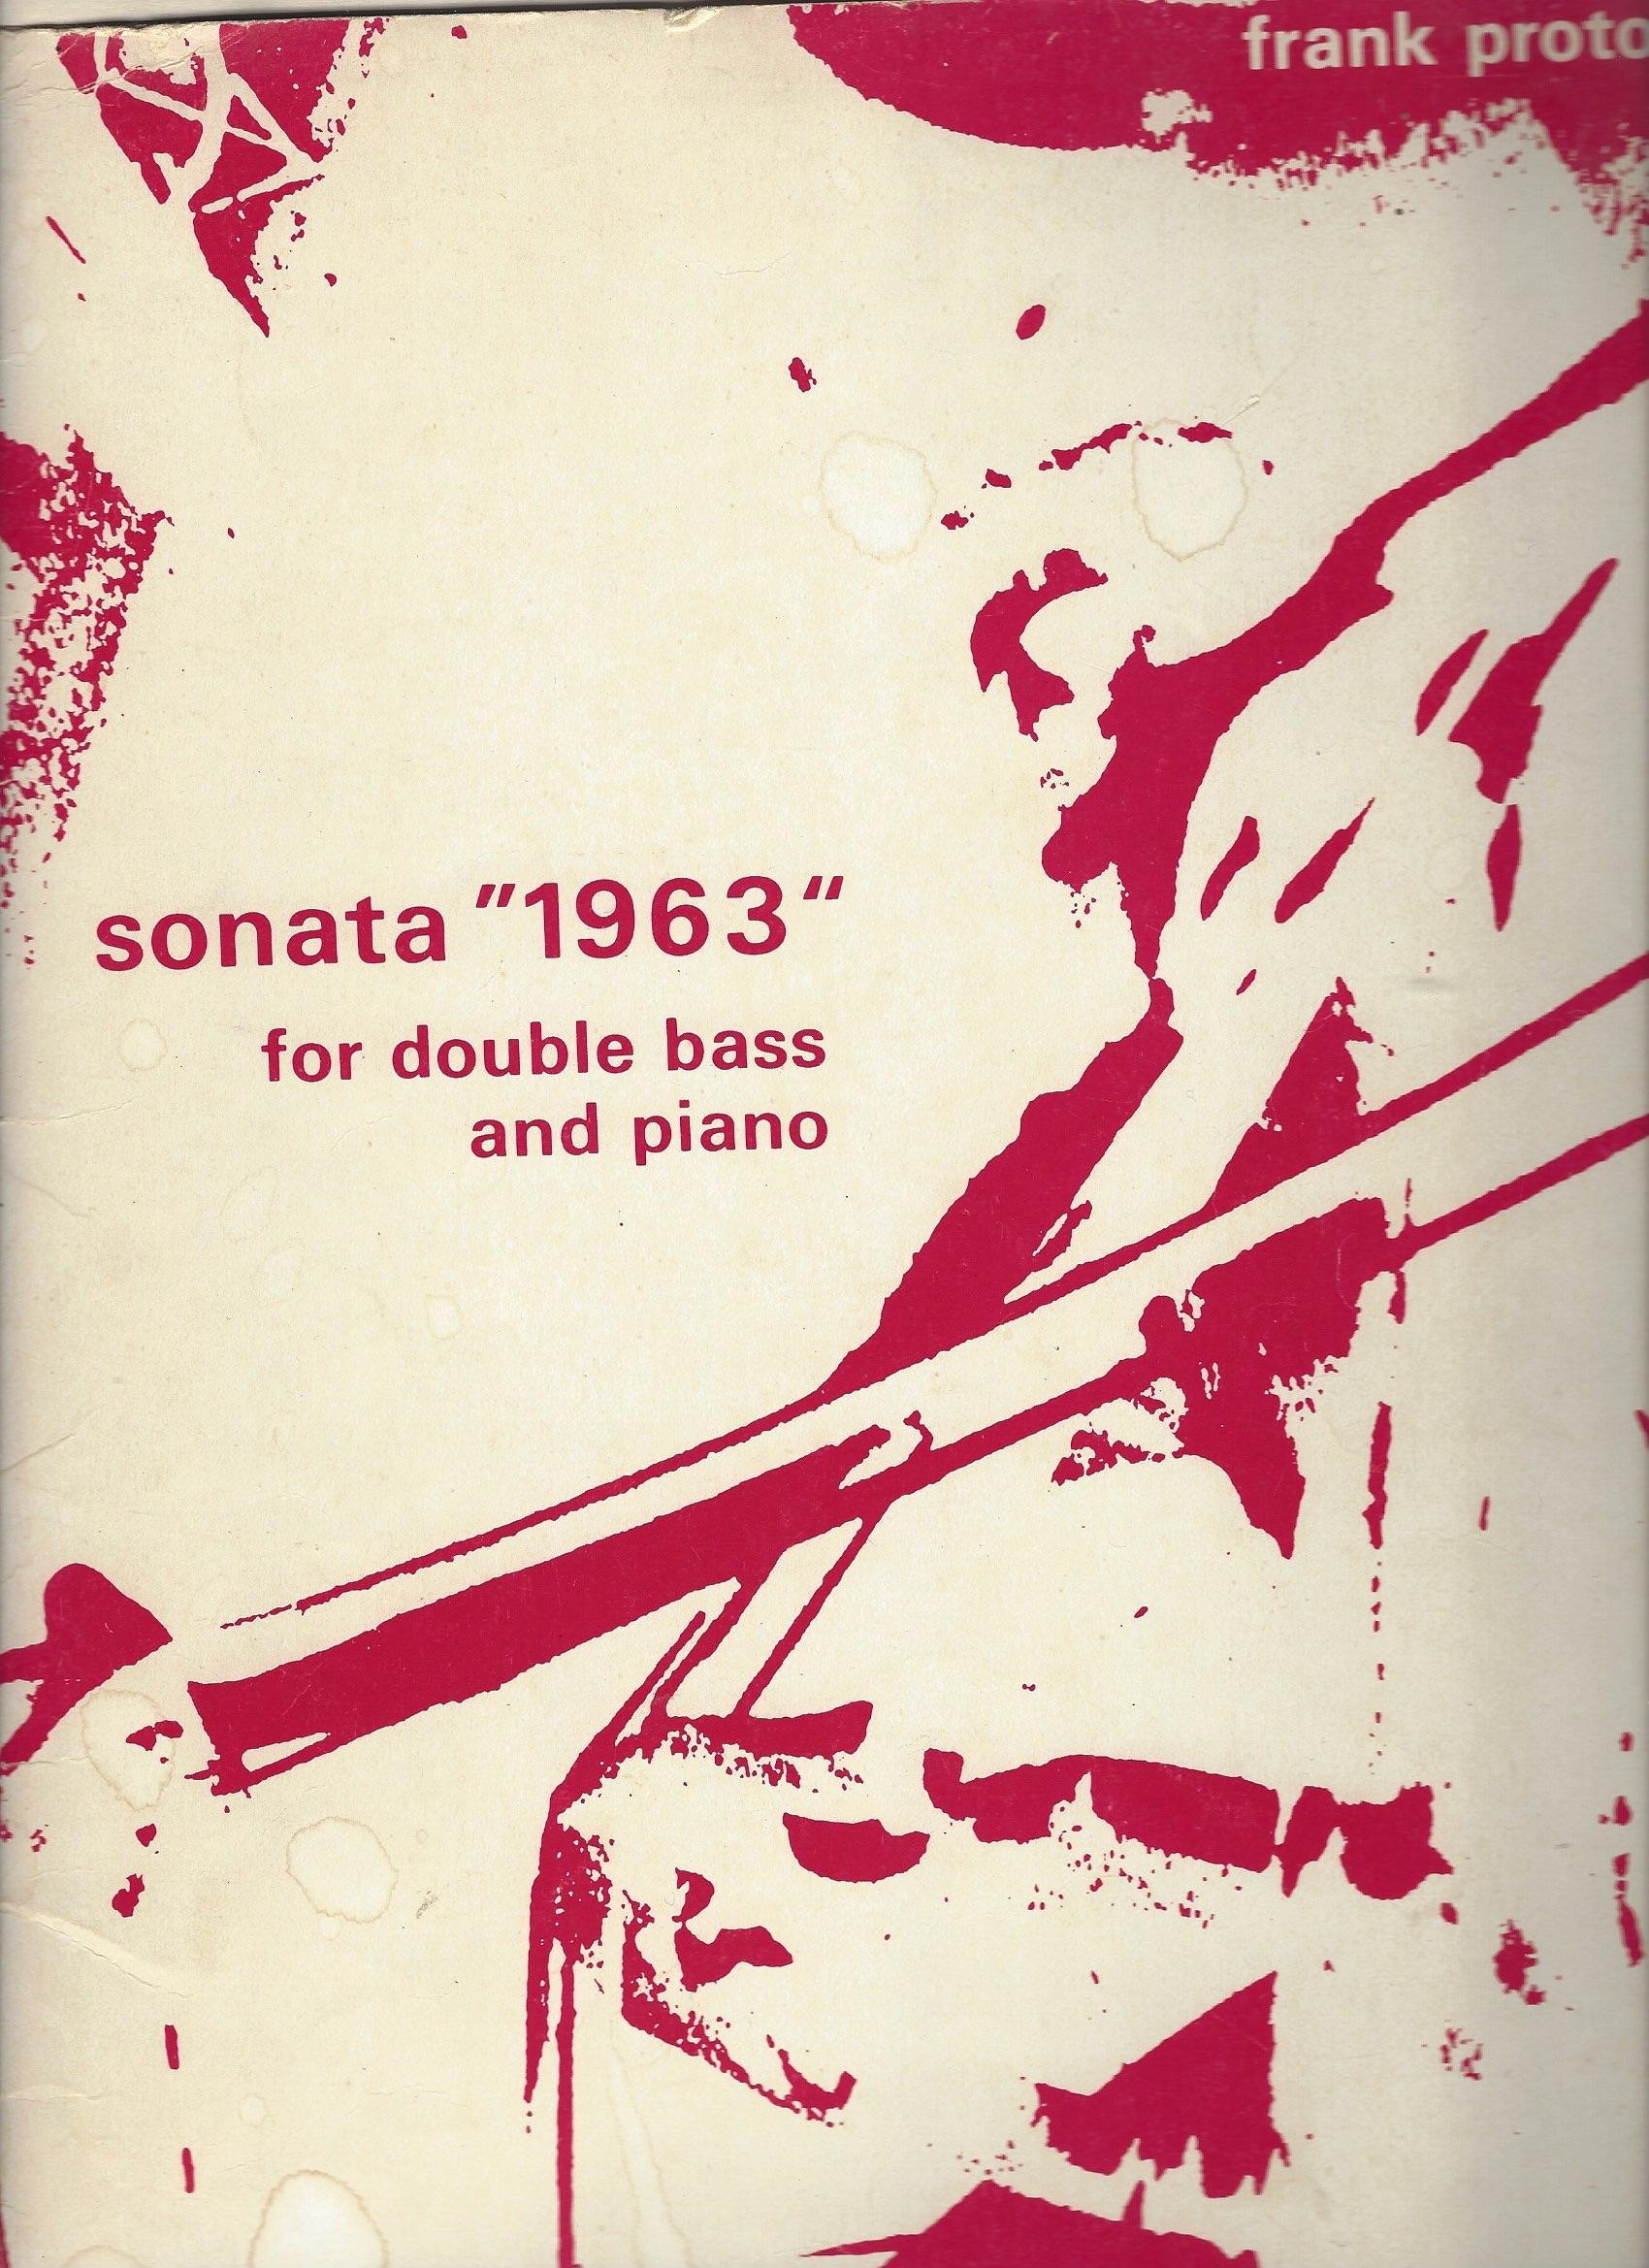 Frank Proto - Sonate 1963